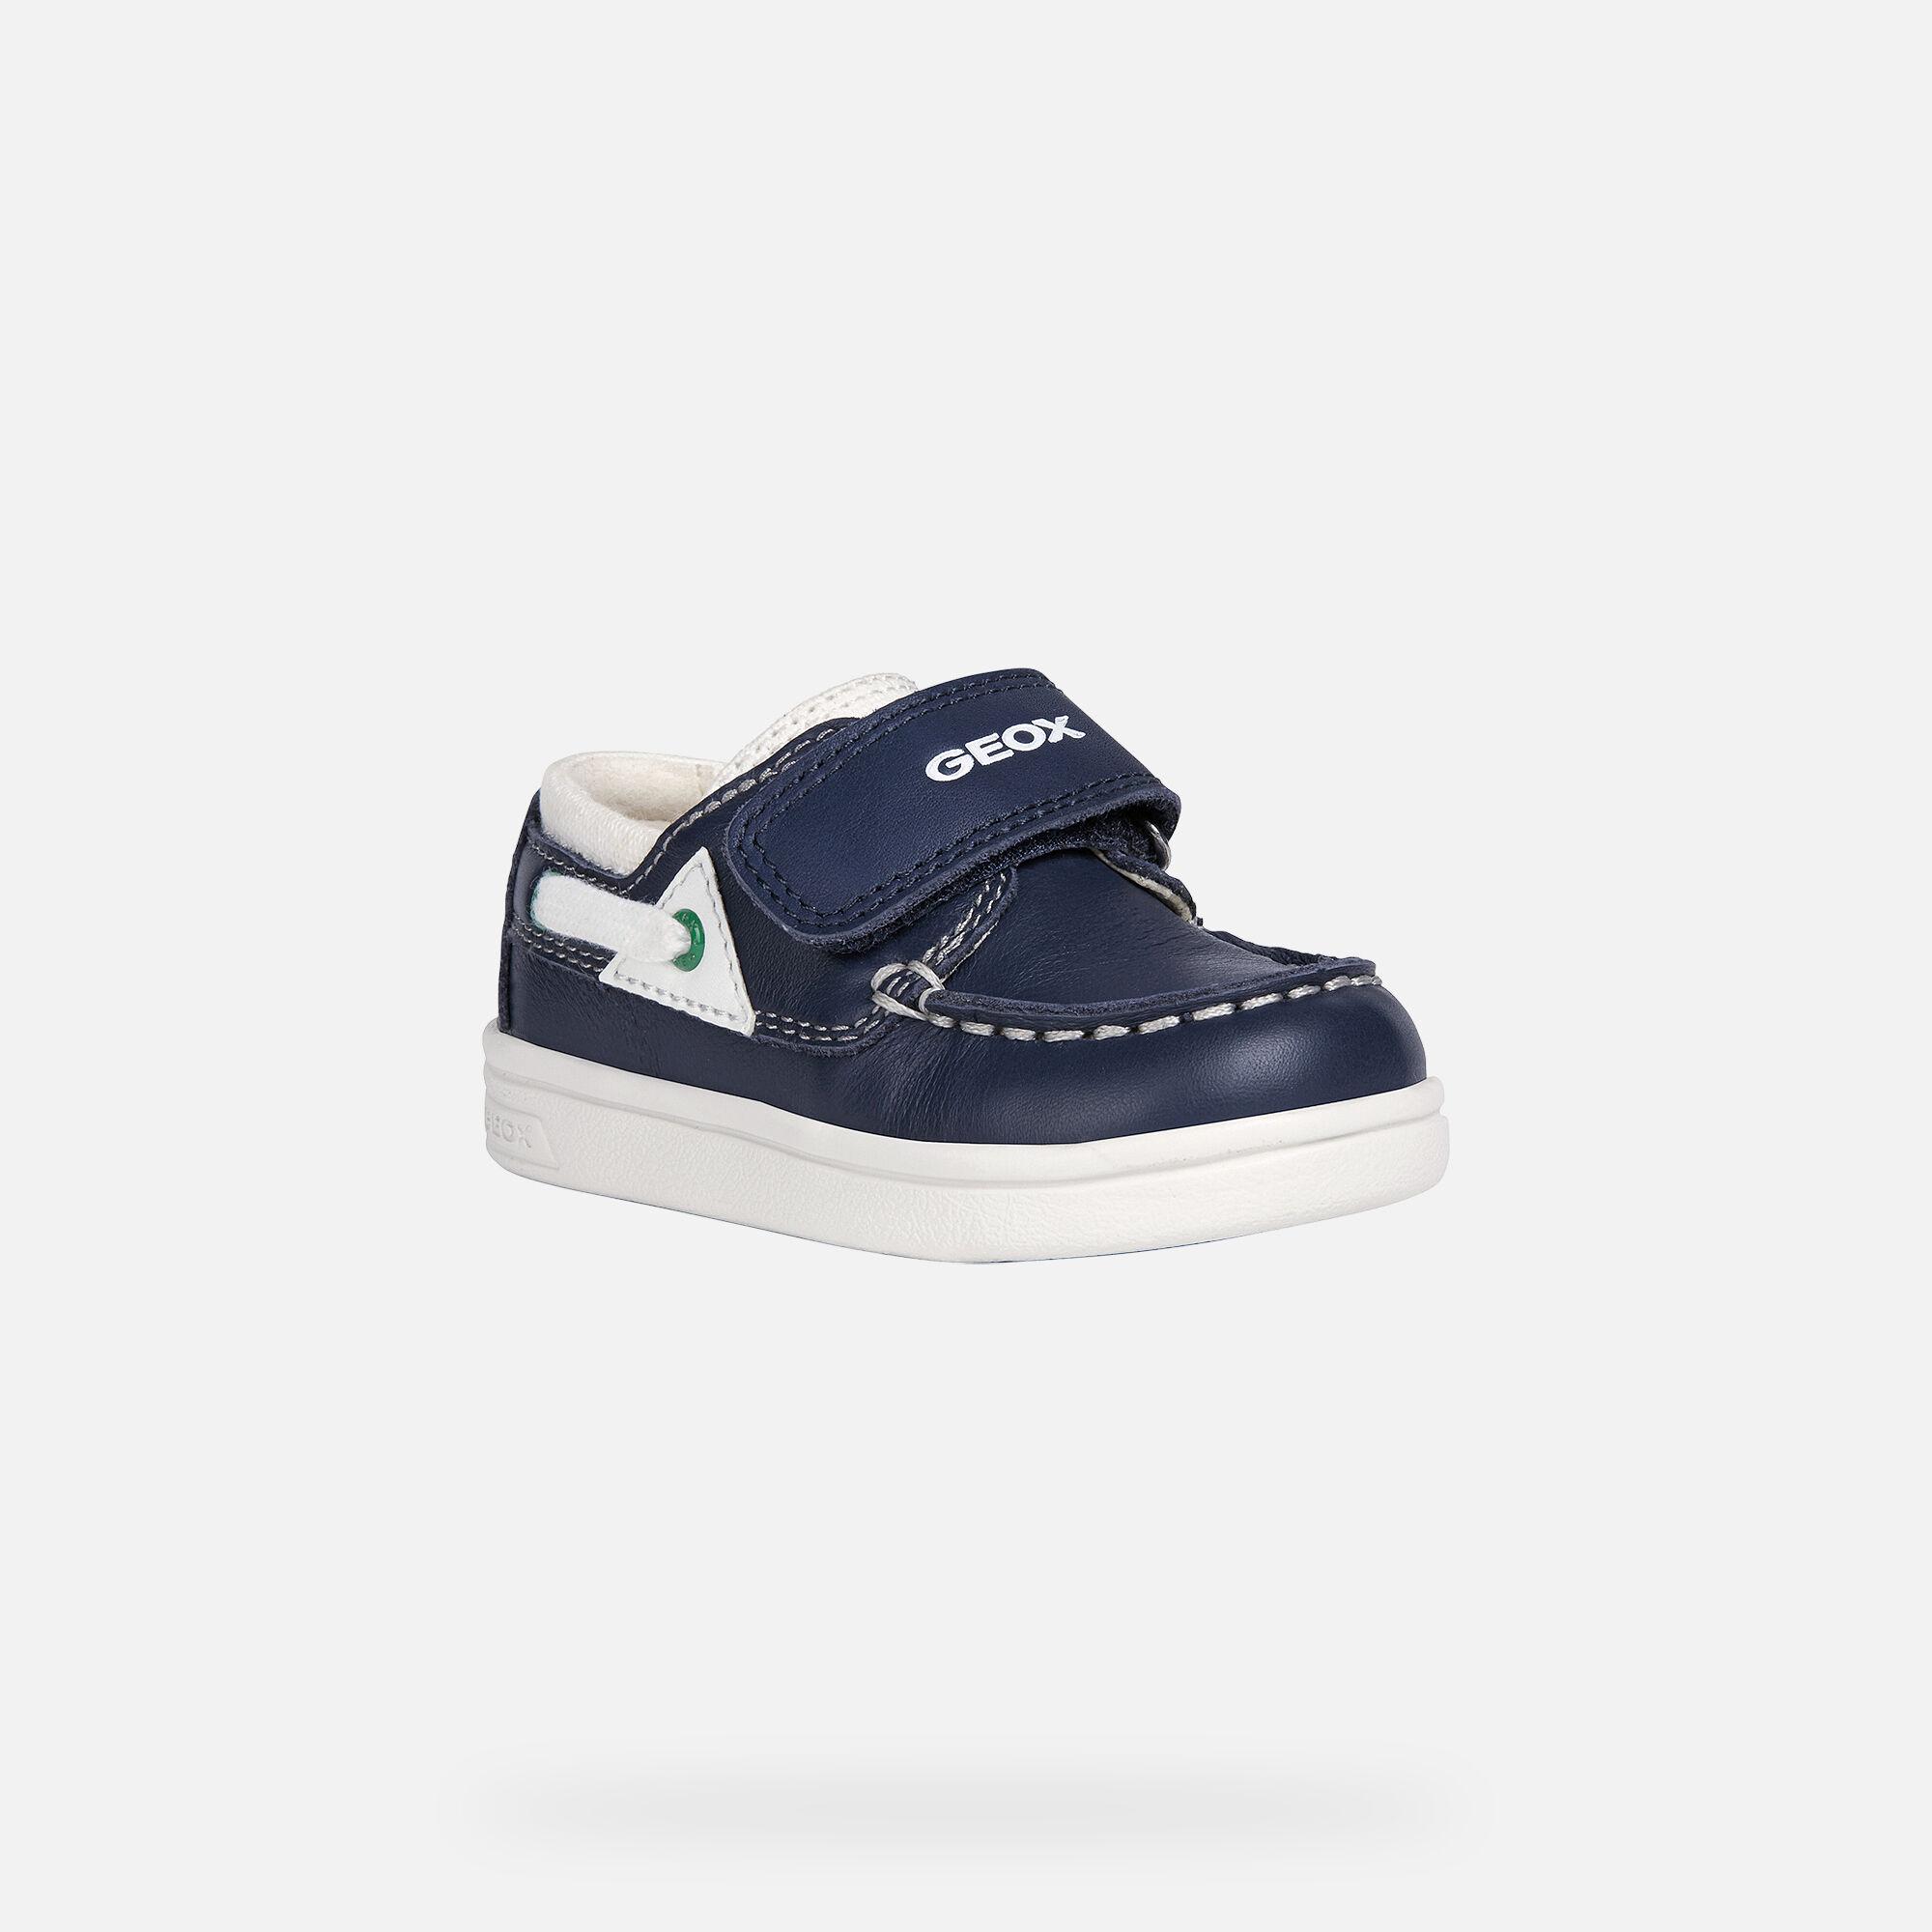 Geox DJROCK BABY Boy: Navy Loafers